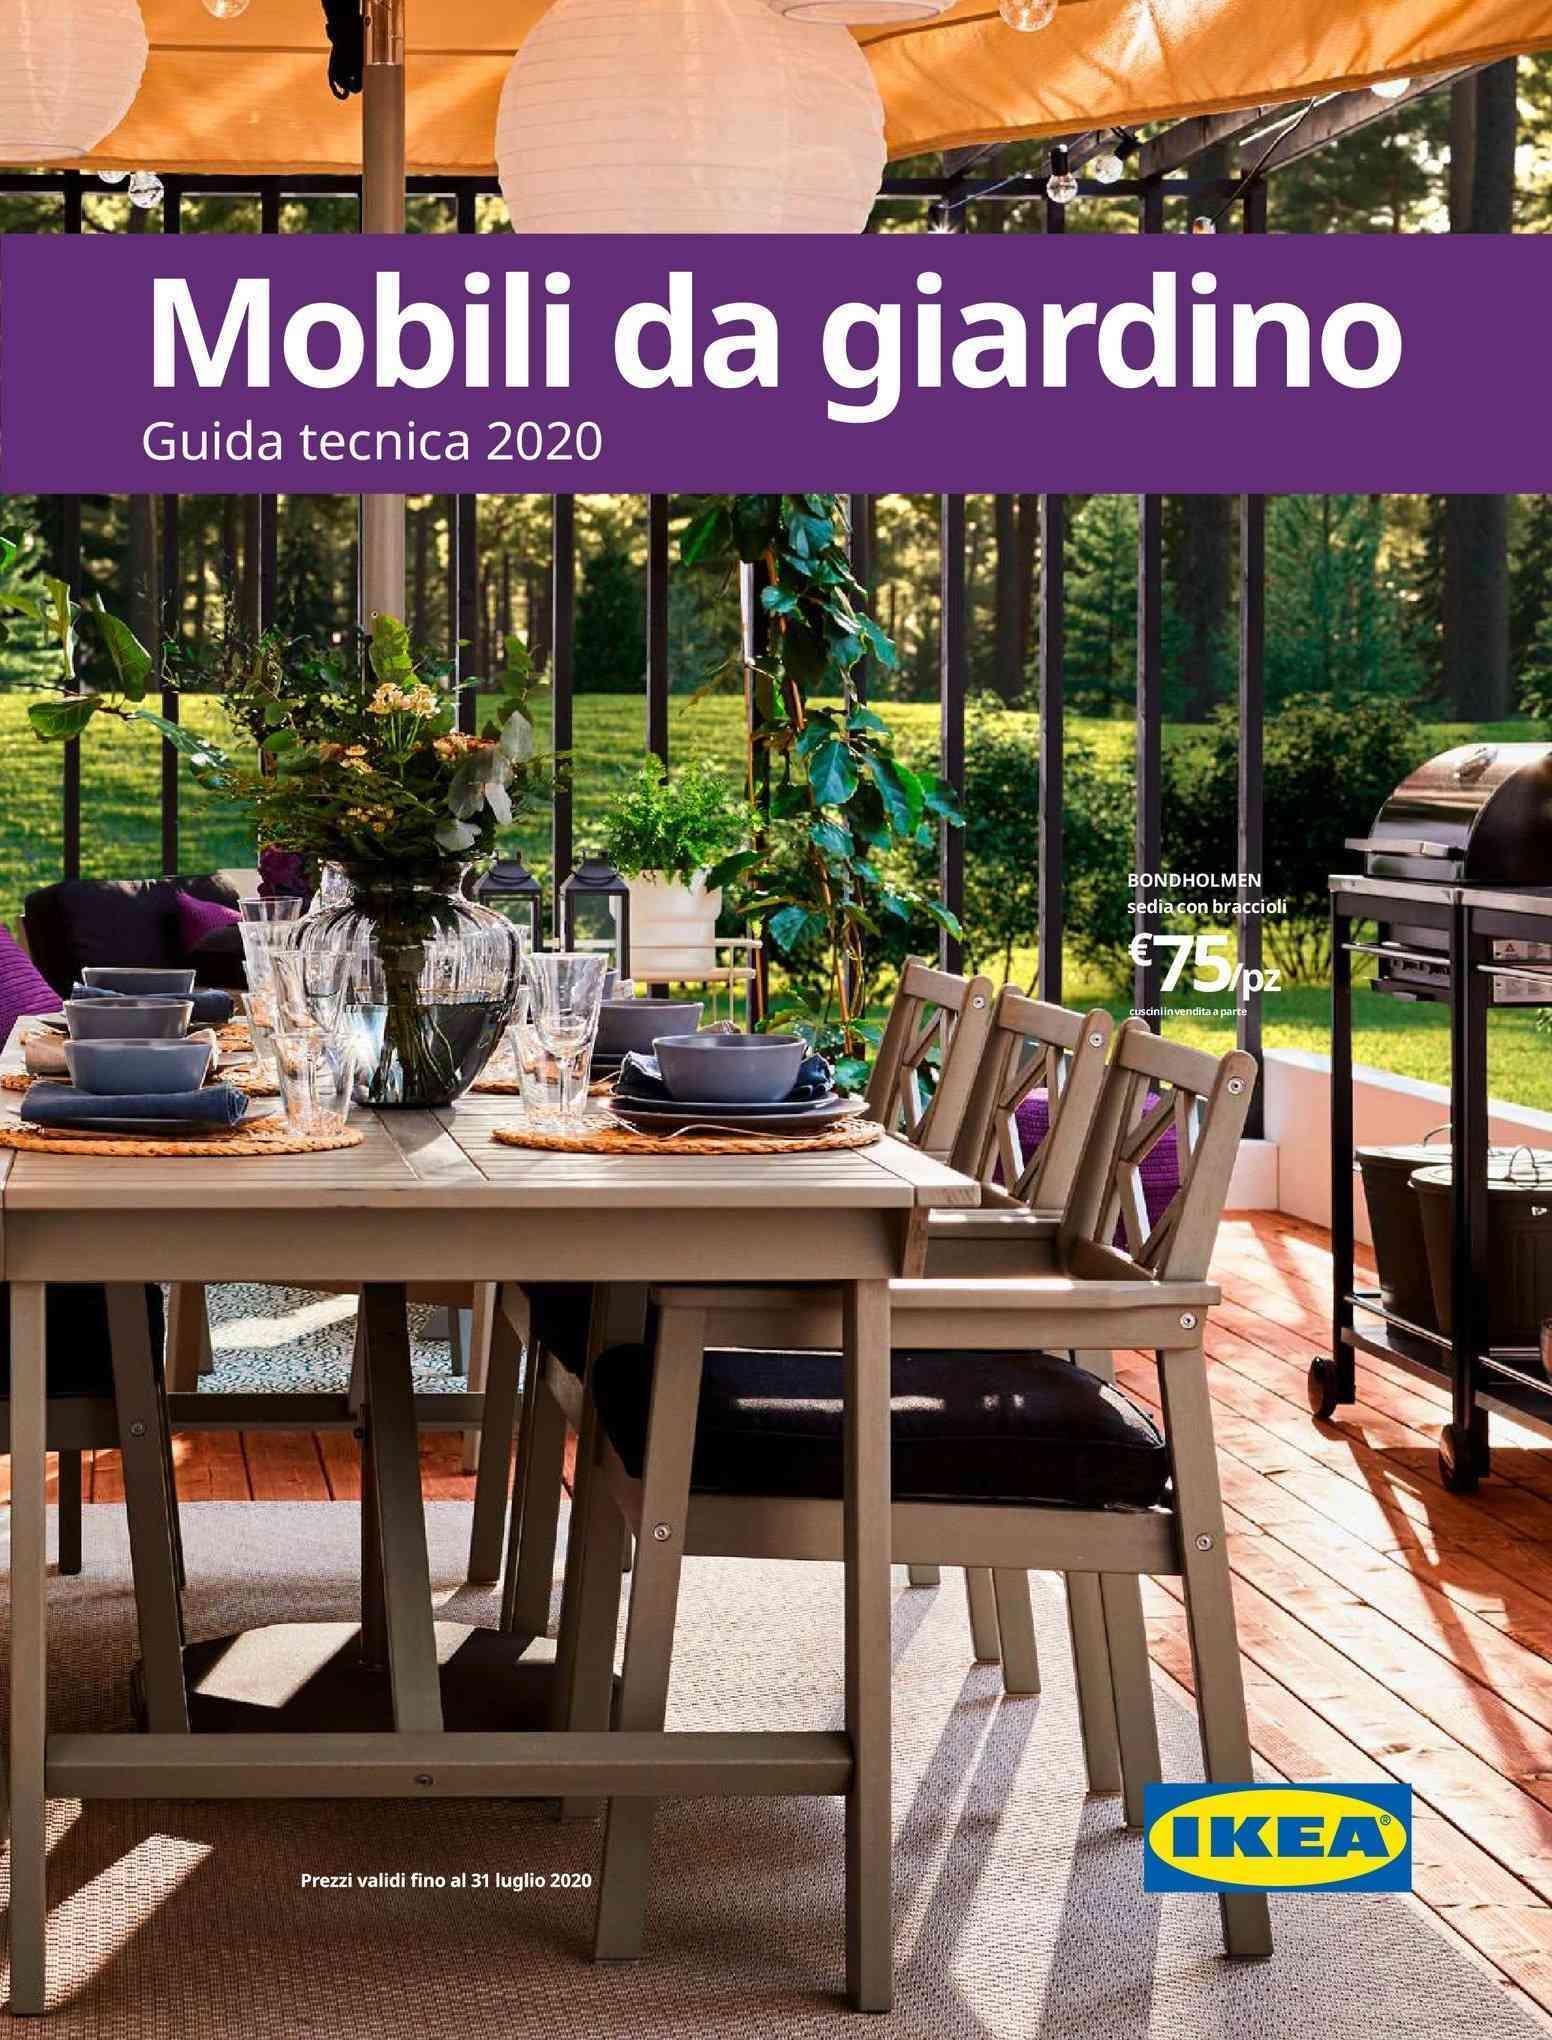 Cerco Tavolo Da Giardino.Offerte Mobili Da Giardino Catania Arredo Giardino Gazebo In Legno